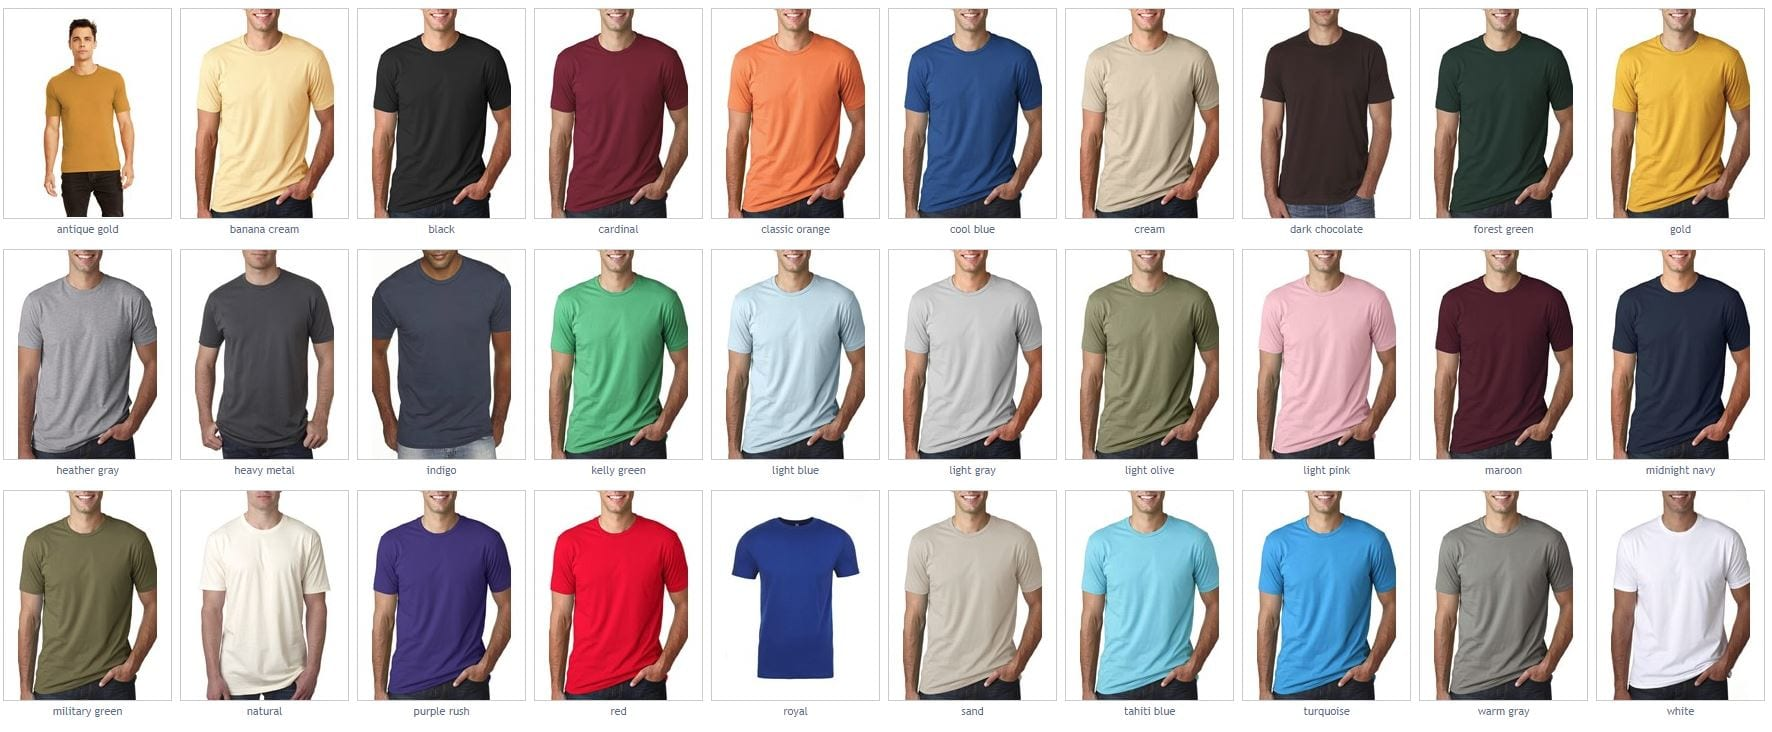 good texture big clearance sale discount up to 60% Next Level 3600 Unisex Cotton 4.3oz T-Shirt - Bulk Custom Shirts